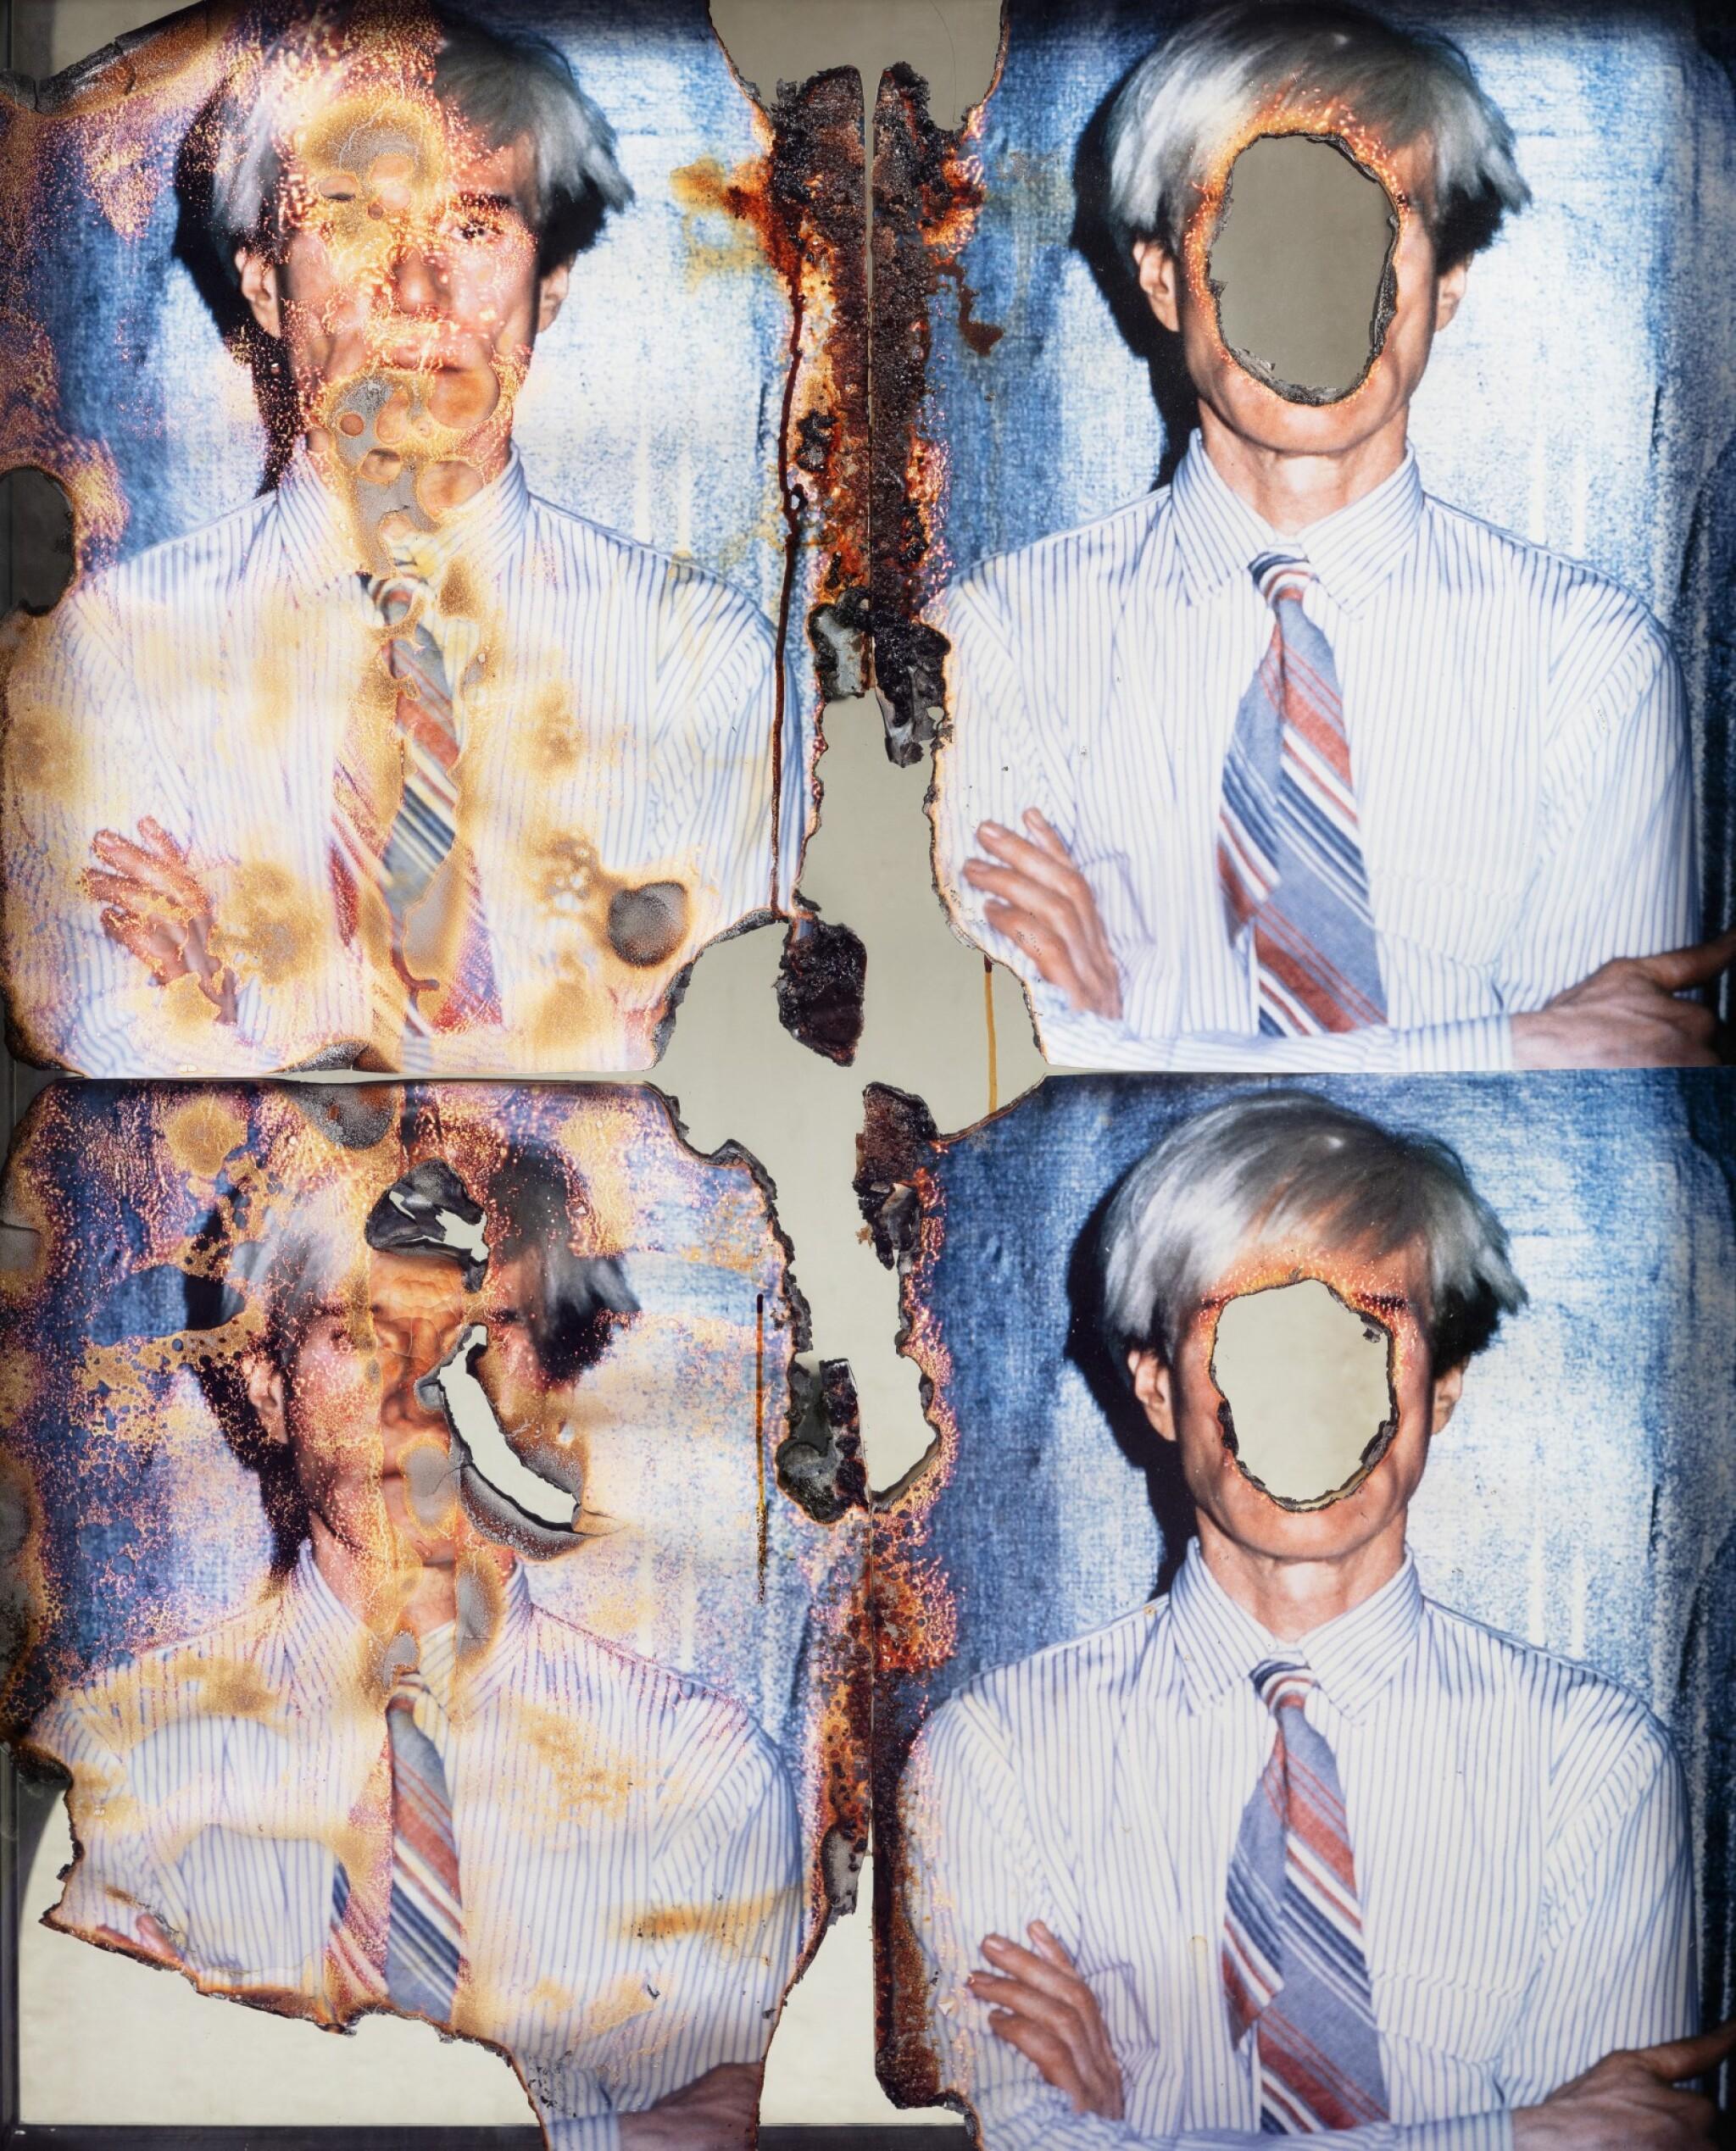 View 1 of Lot 144. Self portrait of You & Me (Warhol 4 part w/4 parts).